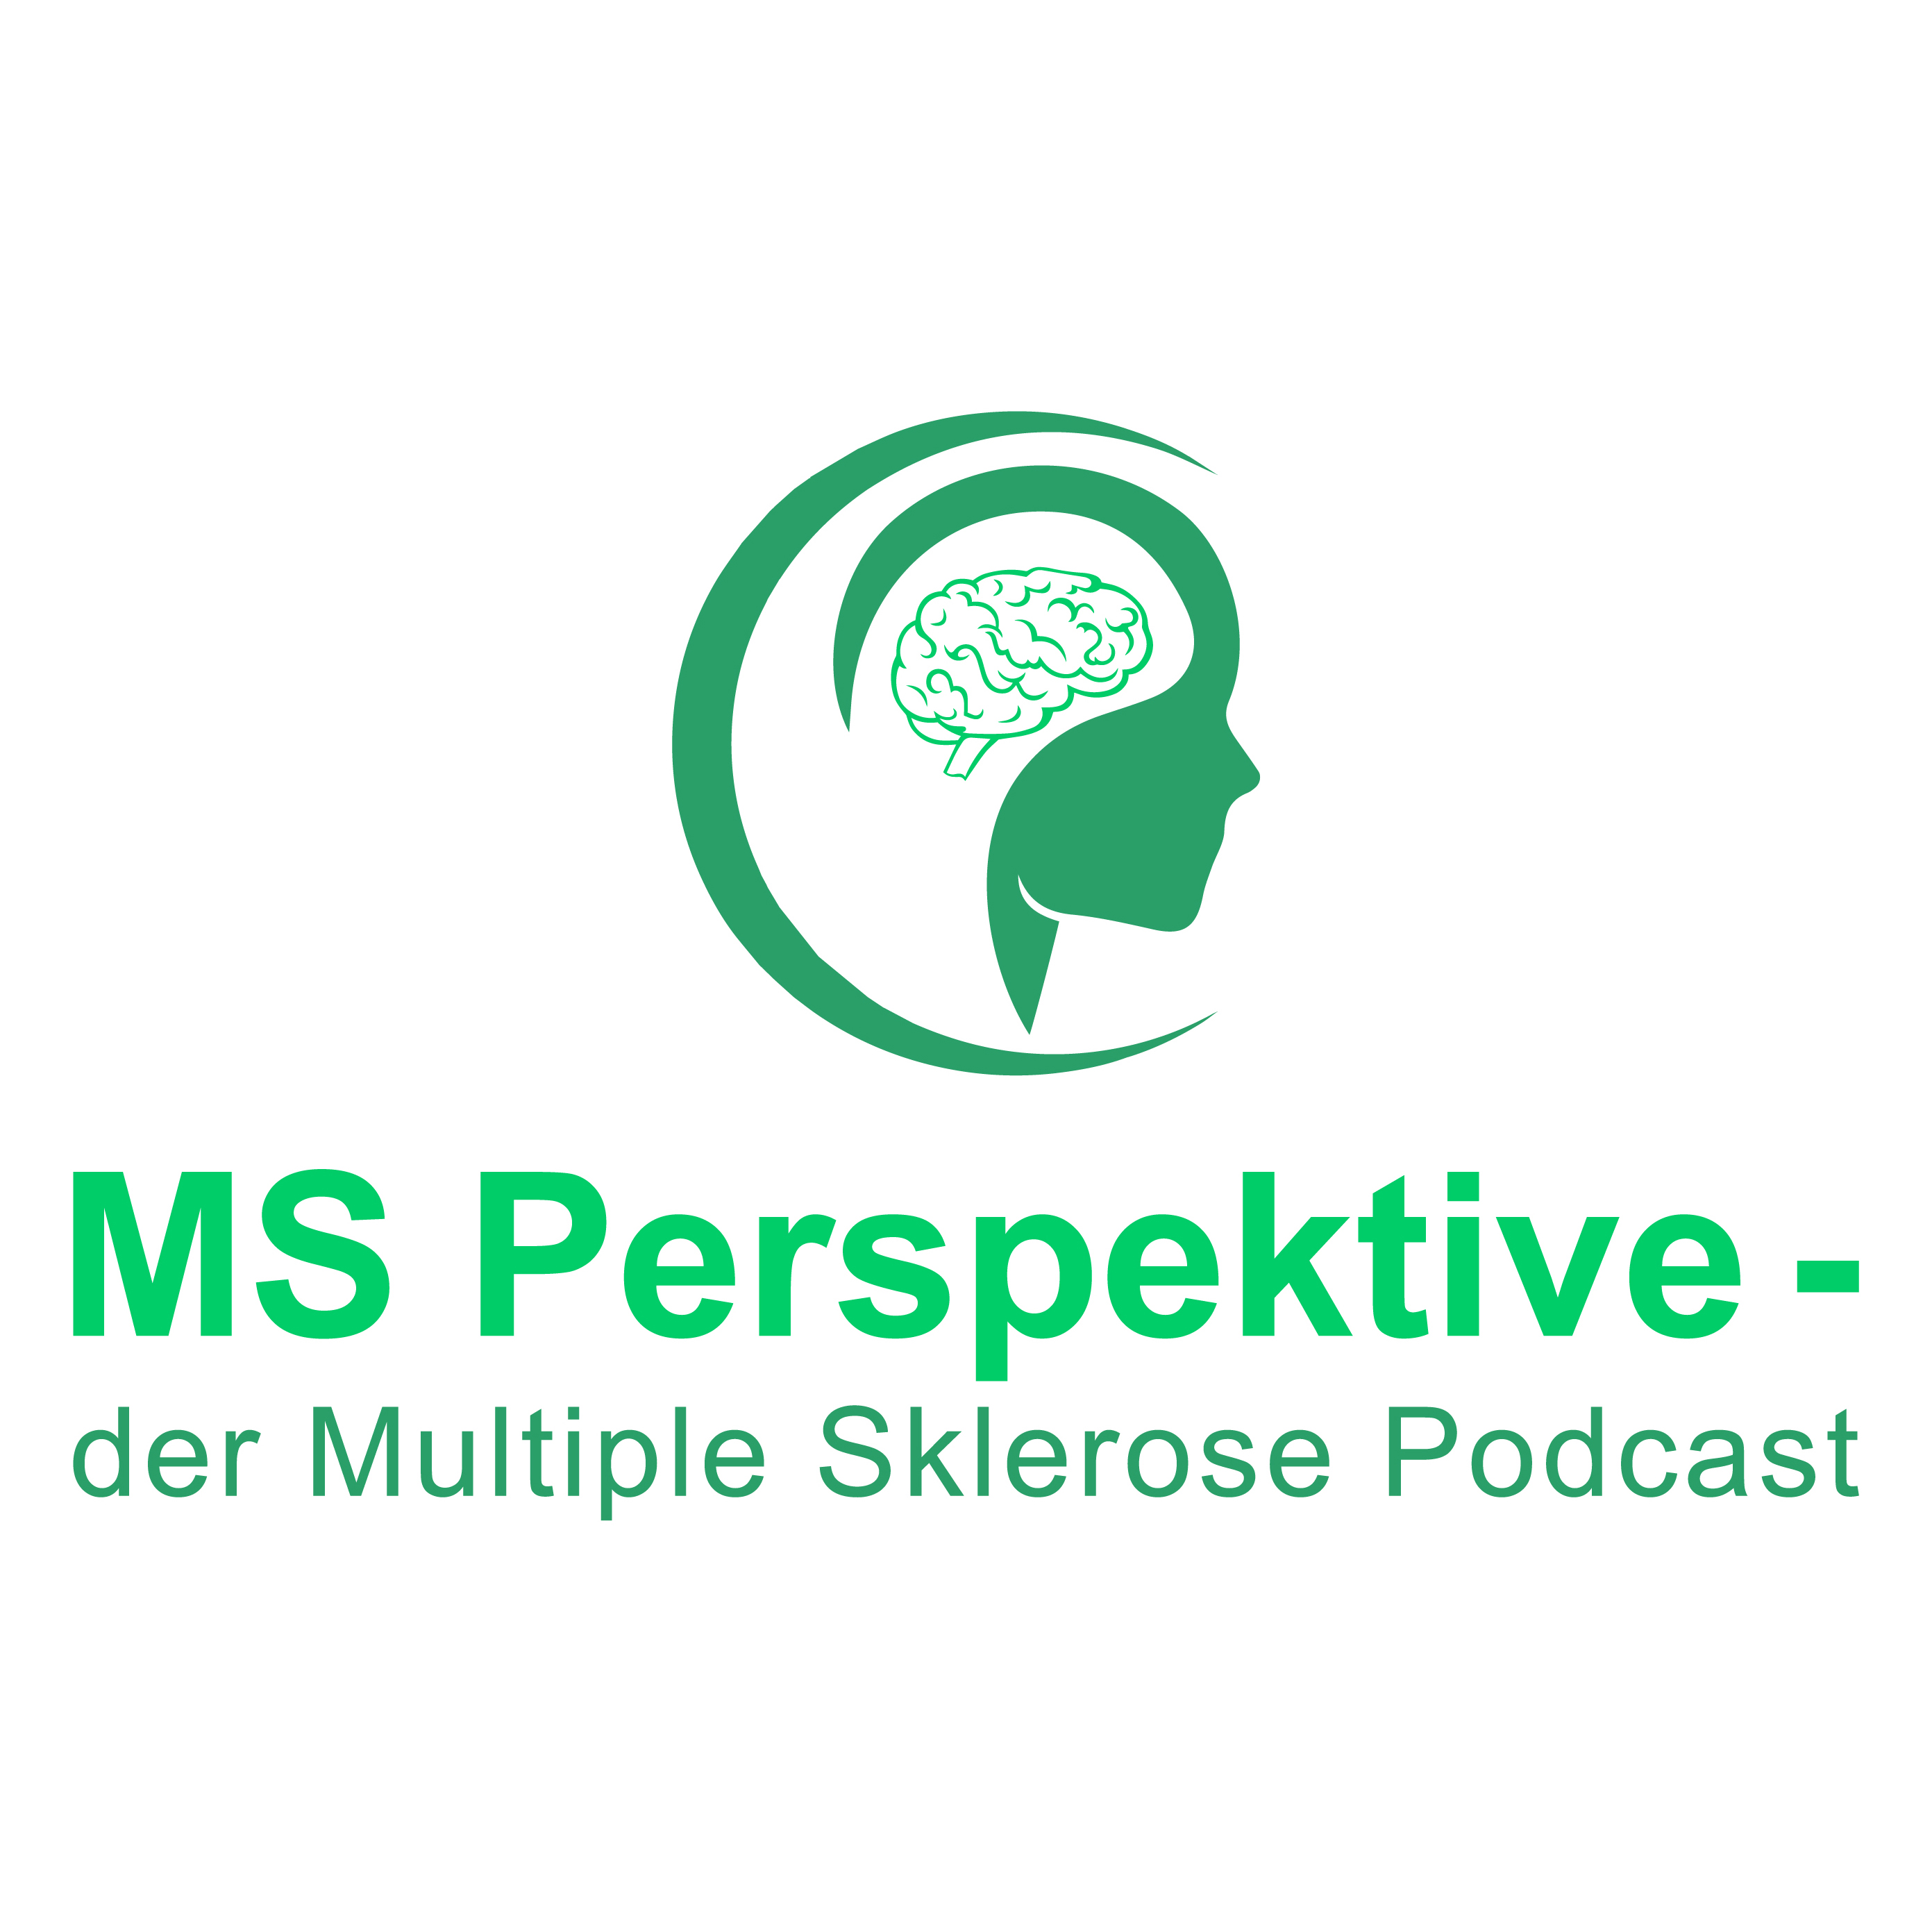 MS-Perspektive - der Multiple Sklerose Podcast mit Nele Handwerker show art